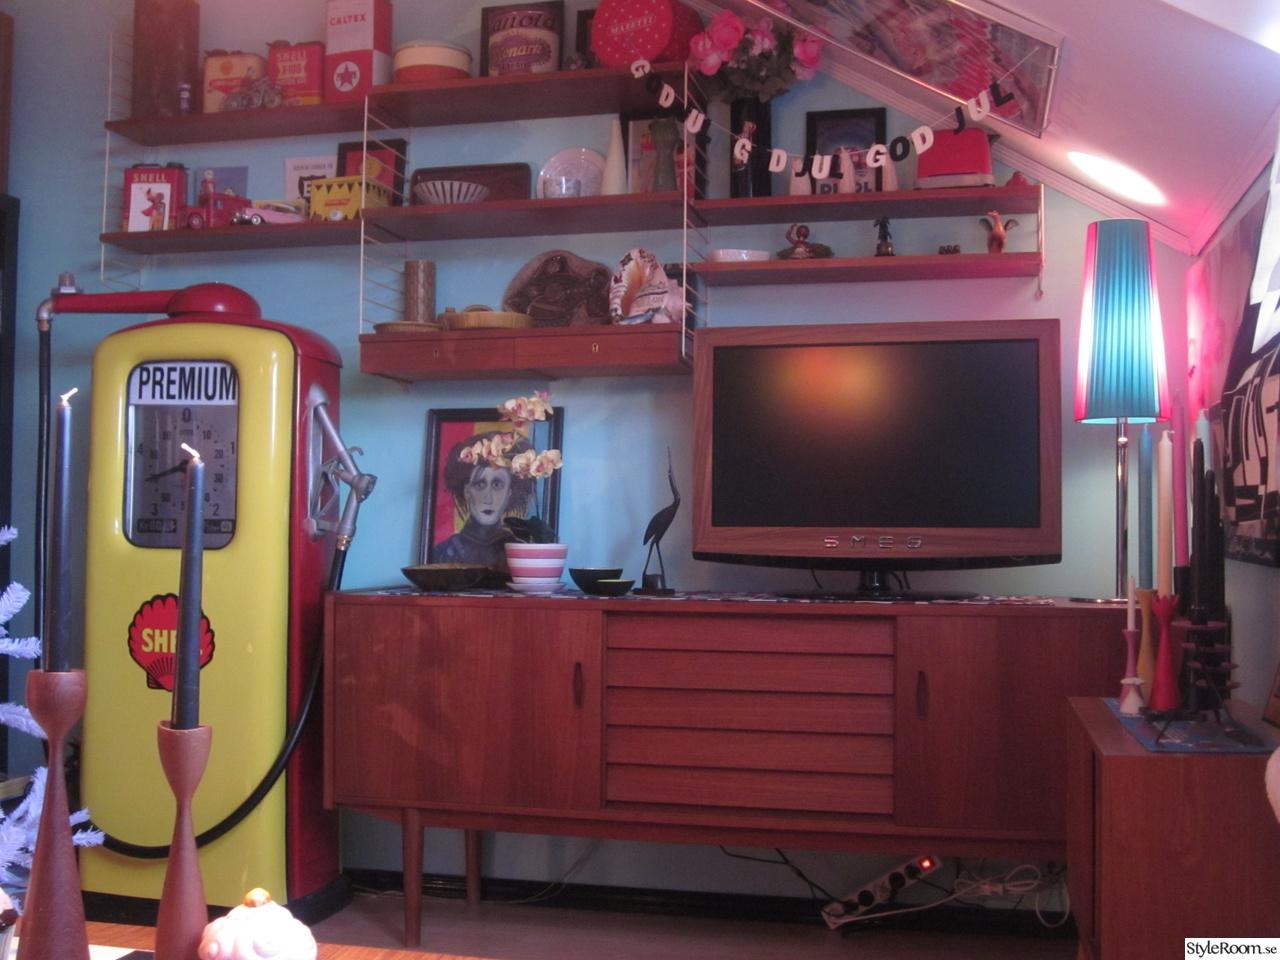 50-tal,retro,nostalgi,teak,sideboard,tv,bensinpump,stringhylla,turkos ...